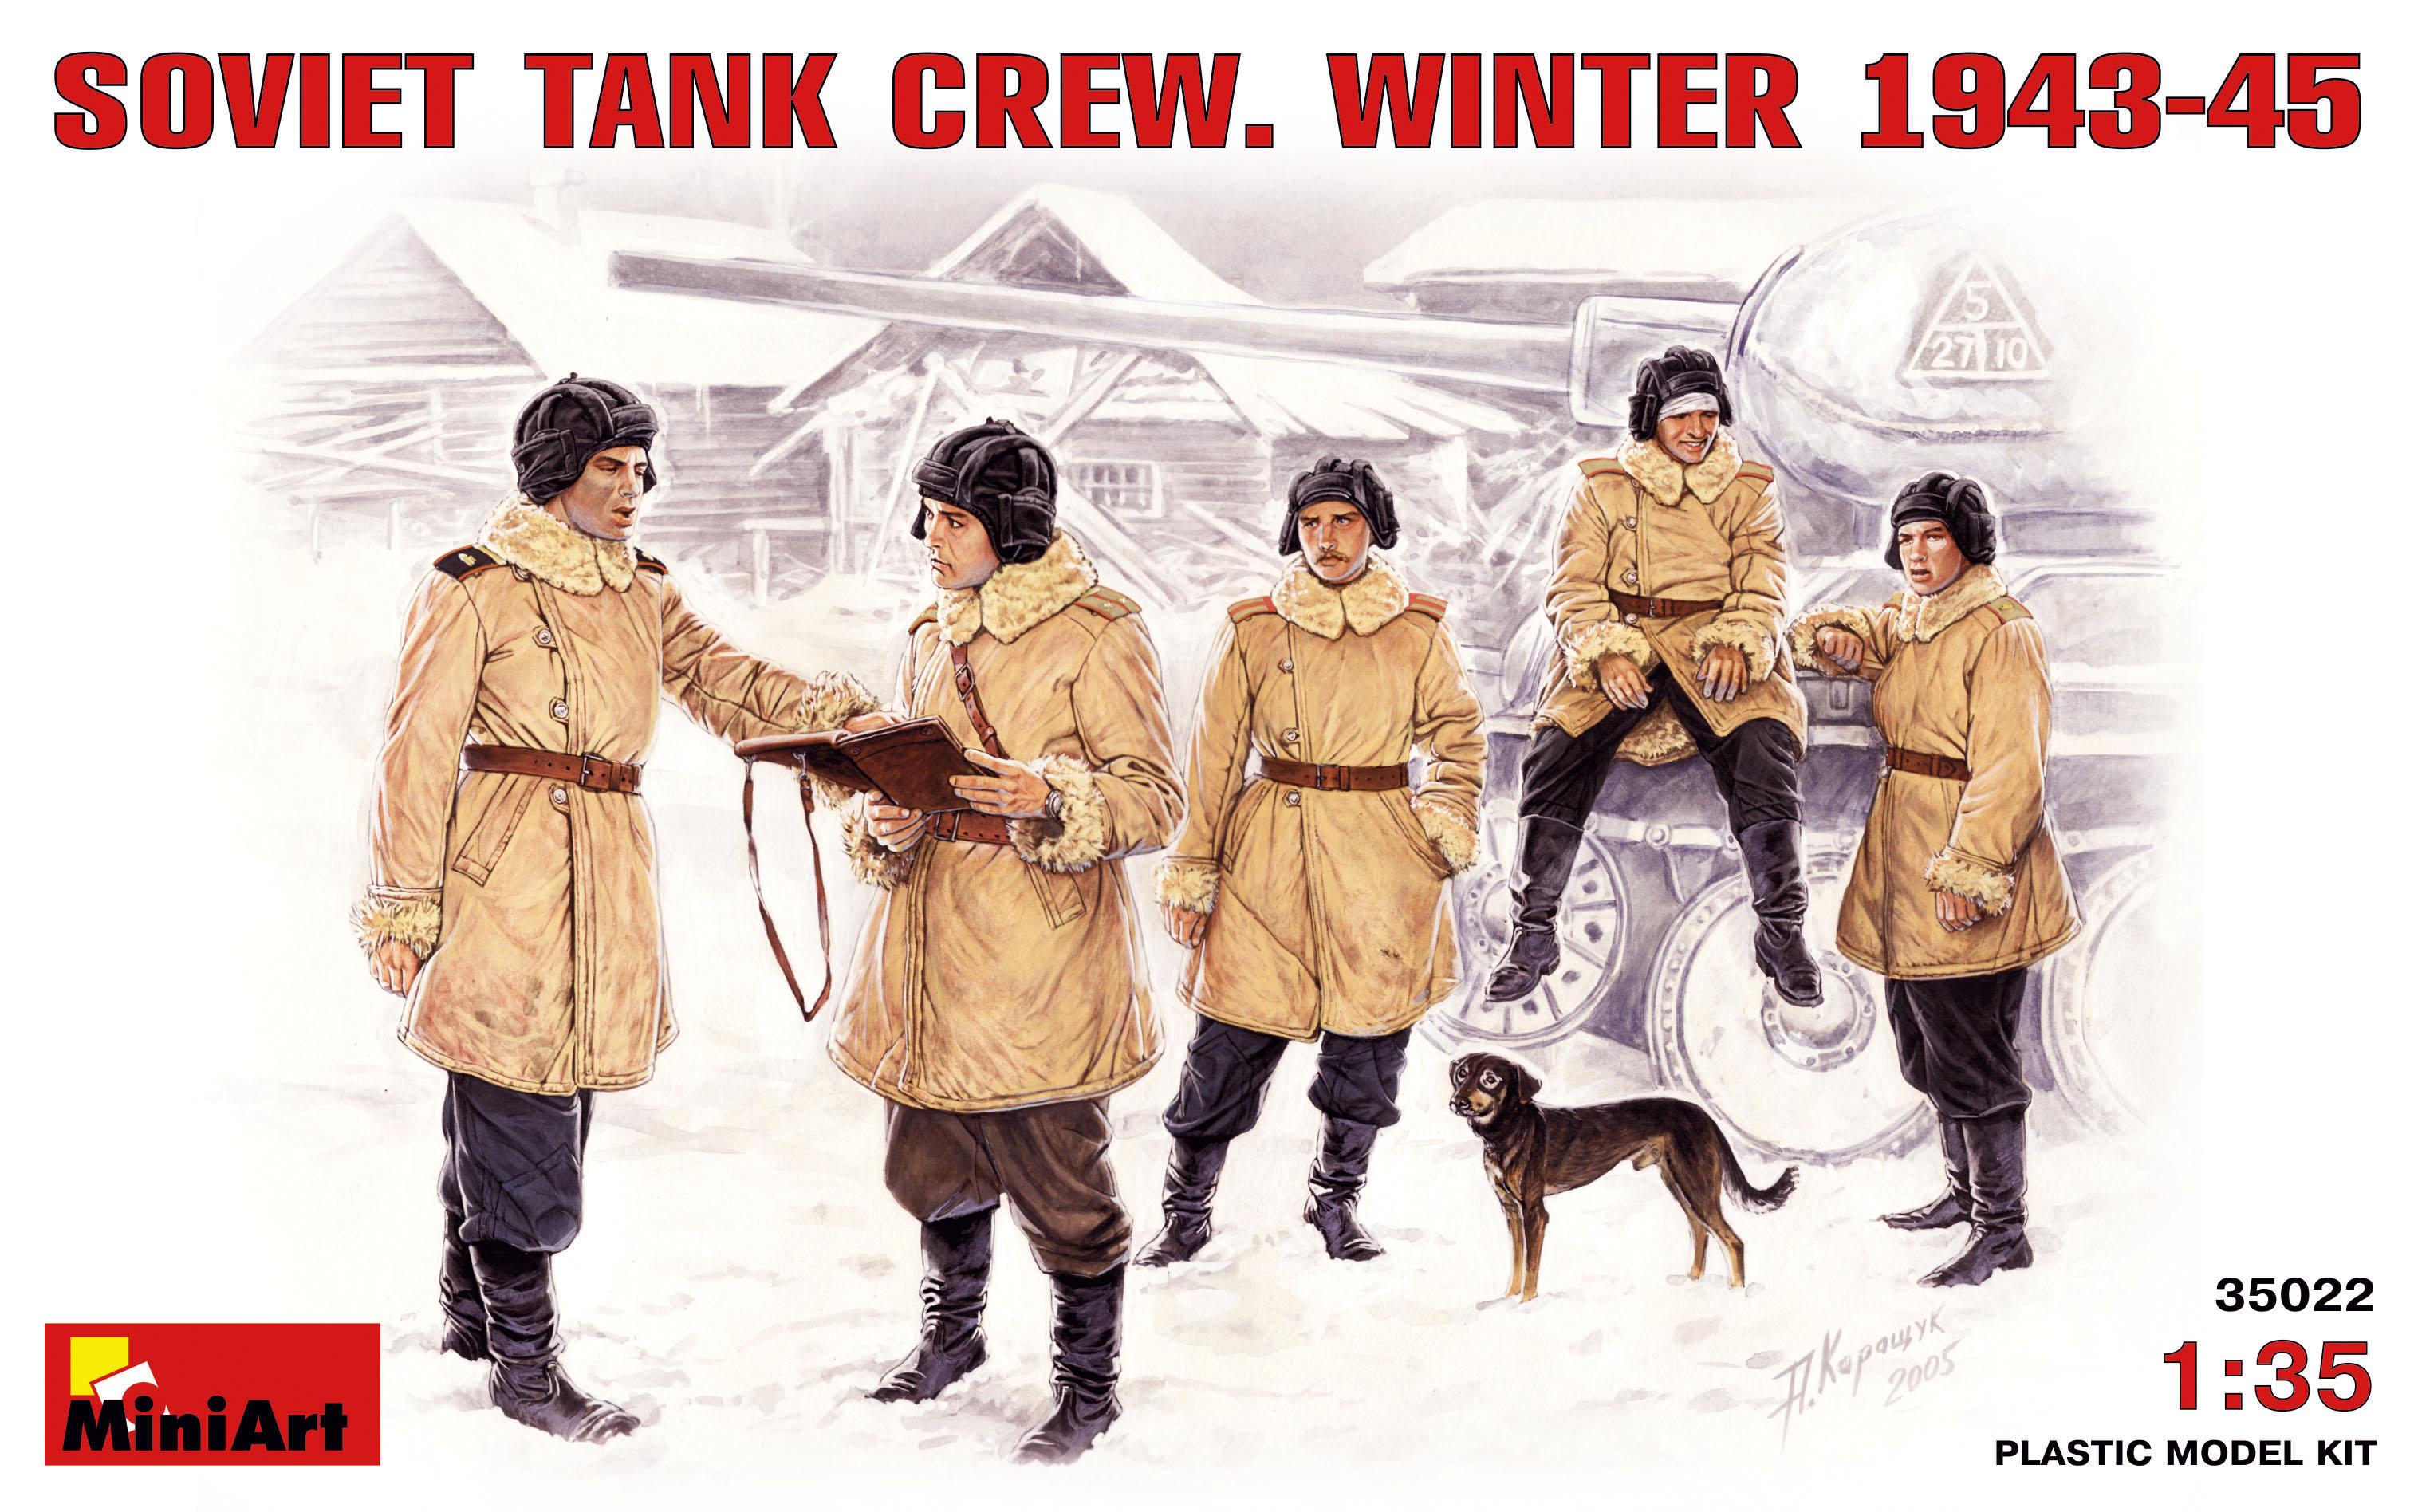 SOVIET TANK CREW. WINTER 1943-45